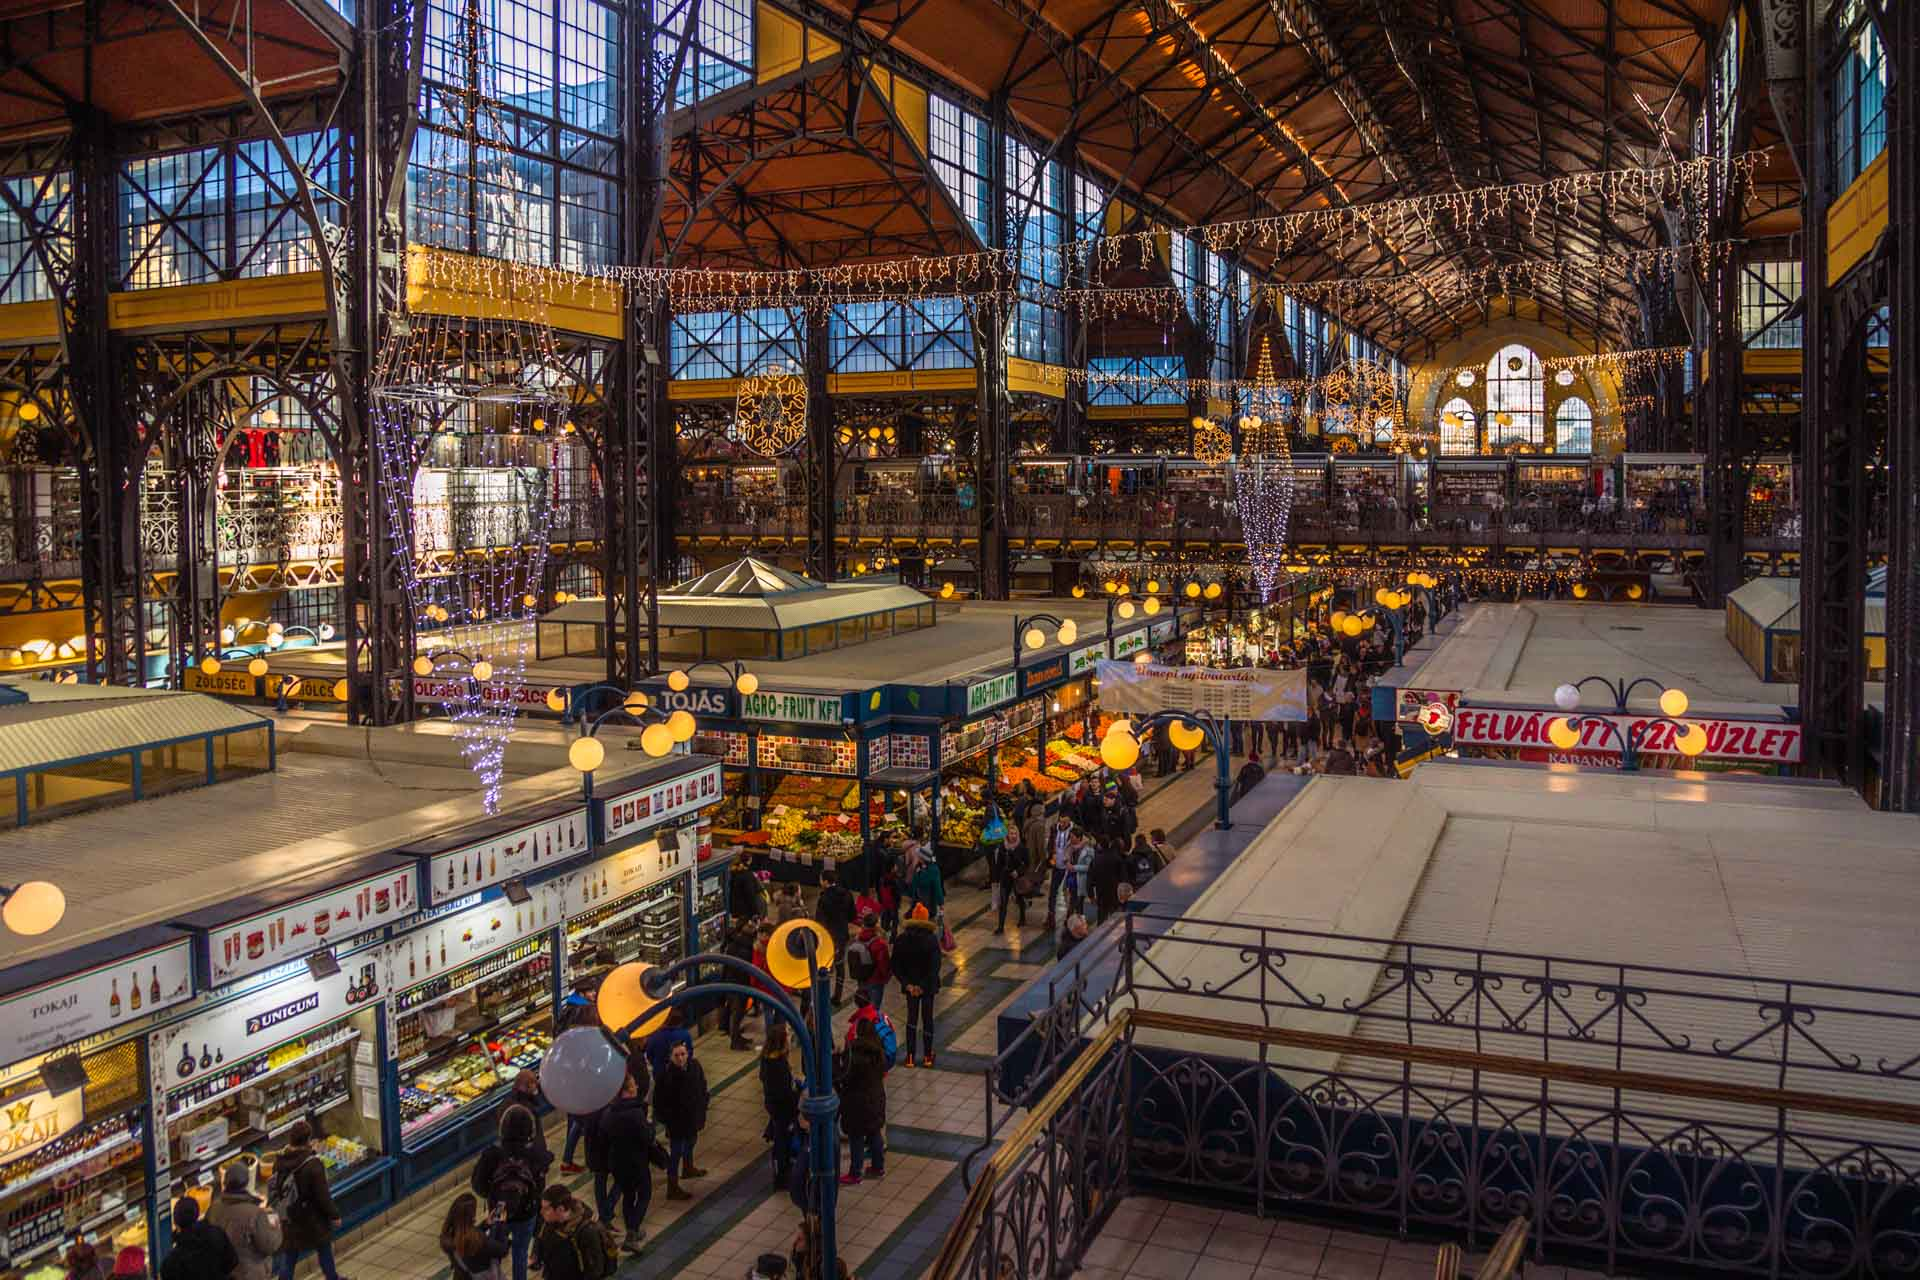 [Bild: ED_1269_2x19_1032-markthalle-budapest-ey...banner.jpg]